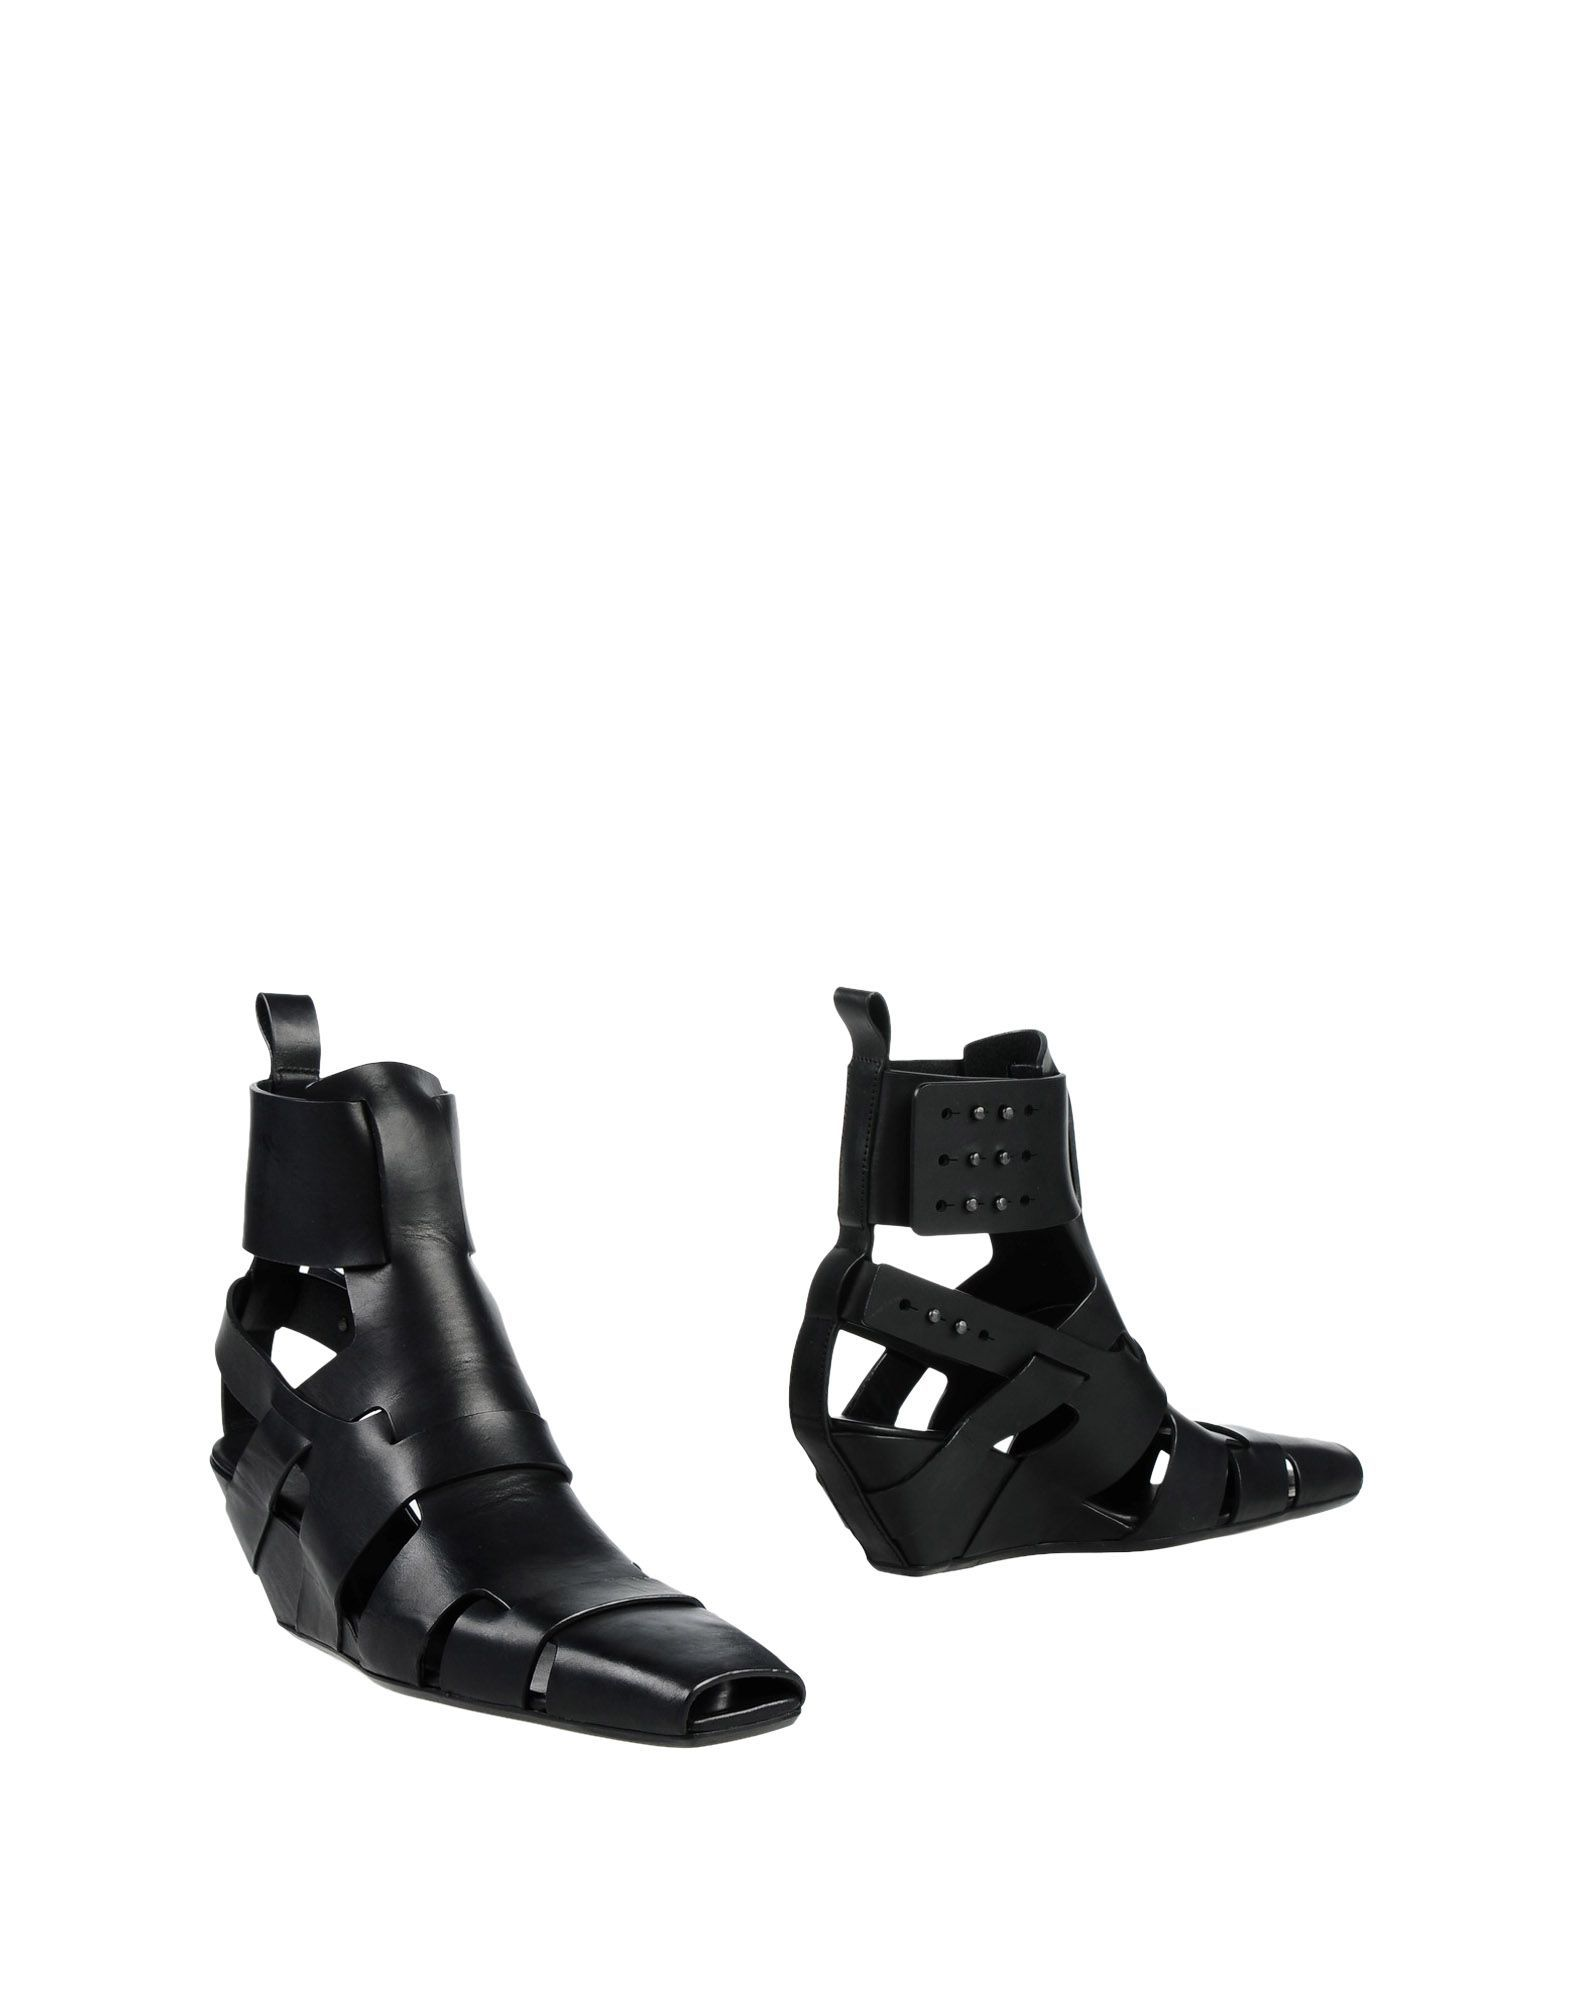 Rick Owens Black Leather Wedges